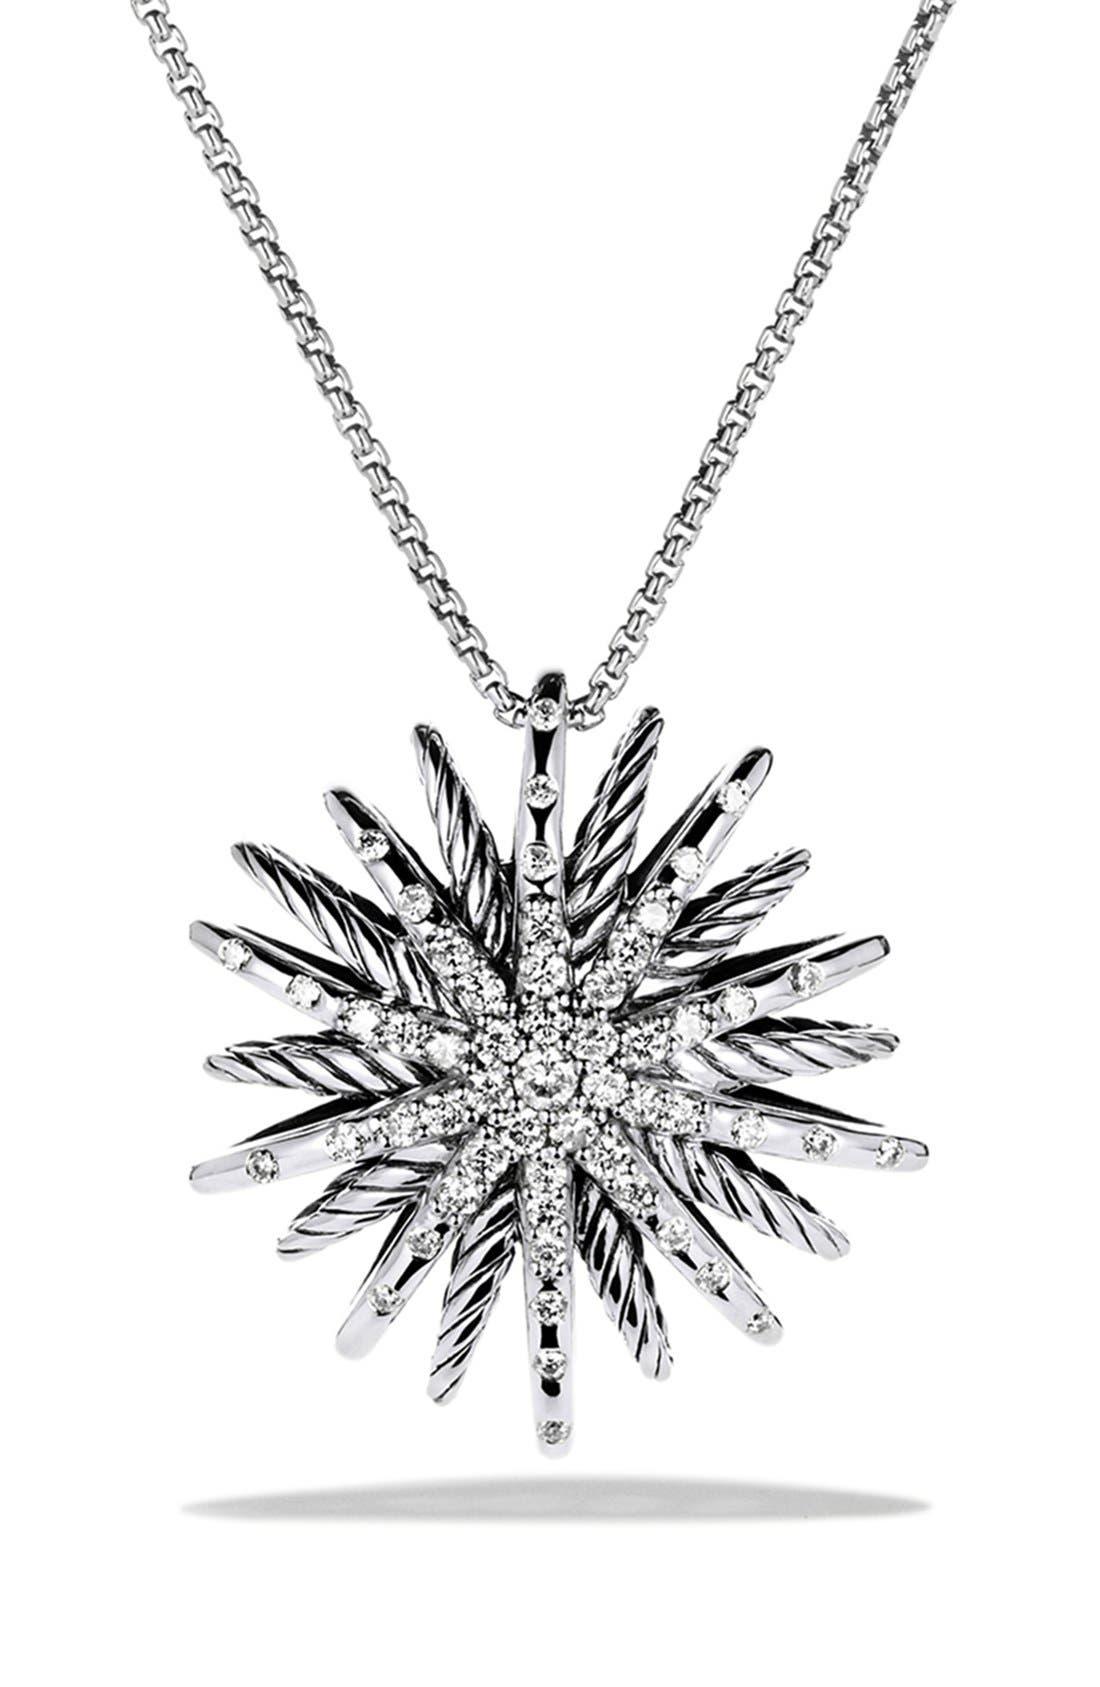 'Starburst' Medium Pendant with Diamonds on Chain,                             Main thumbnail 1, color,                             DIAMOND